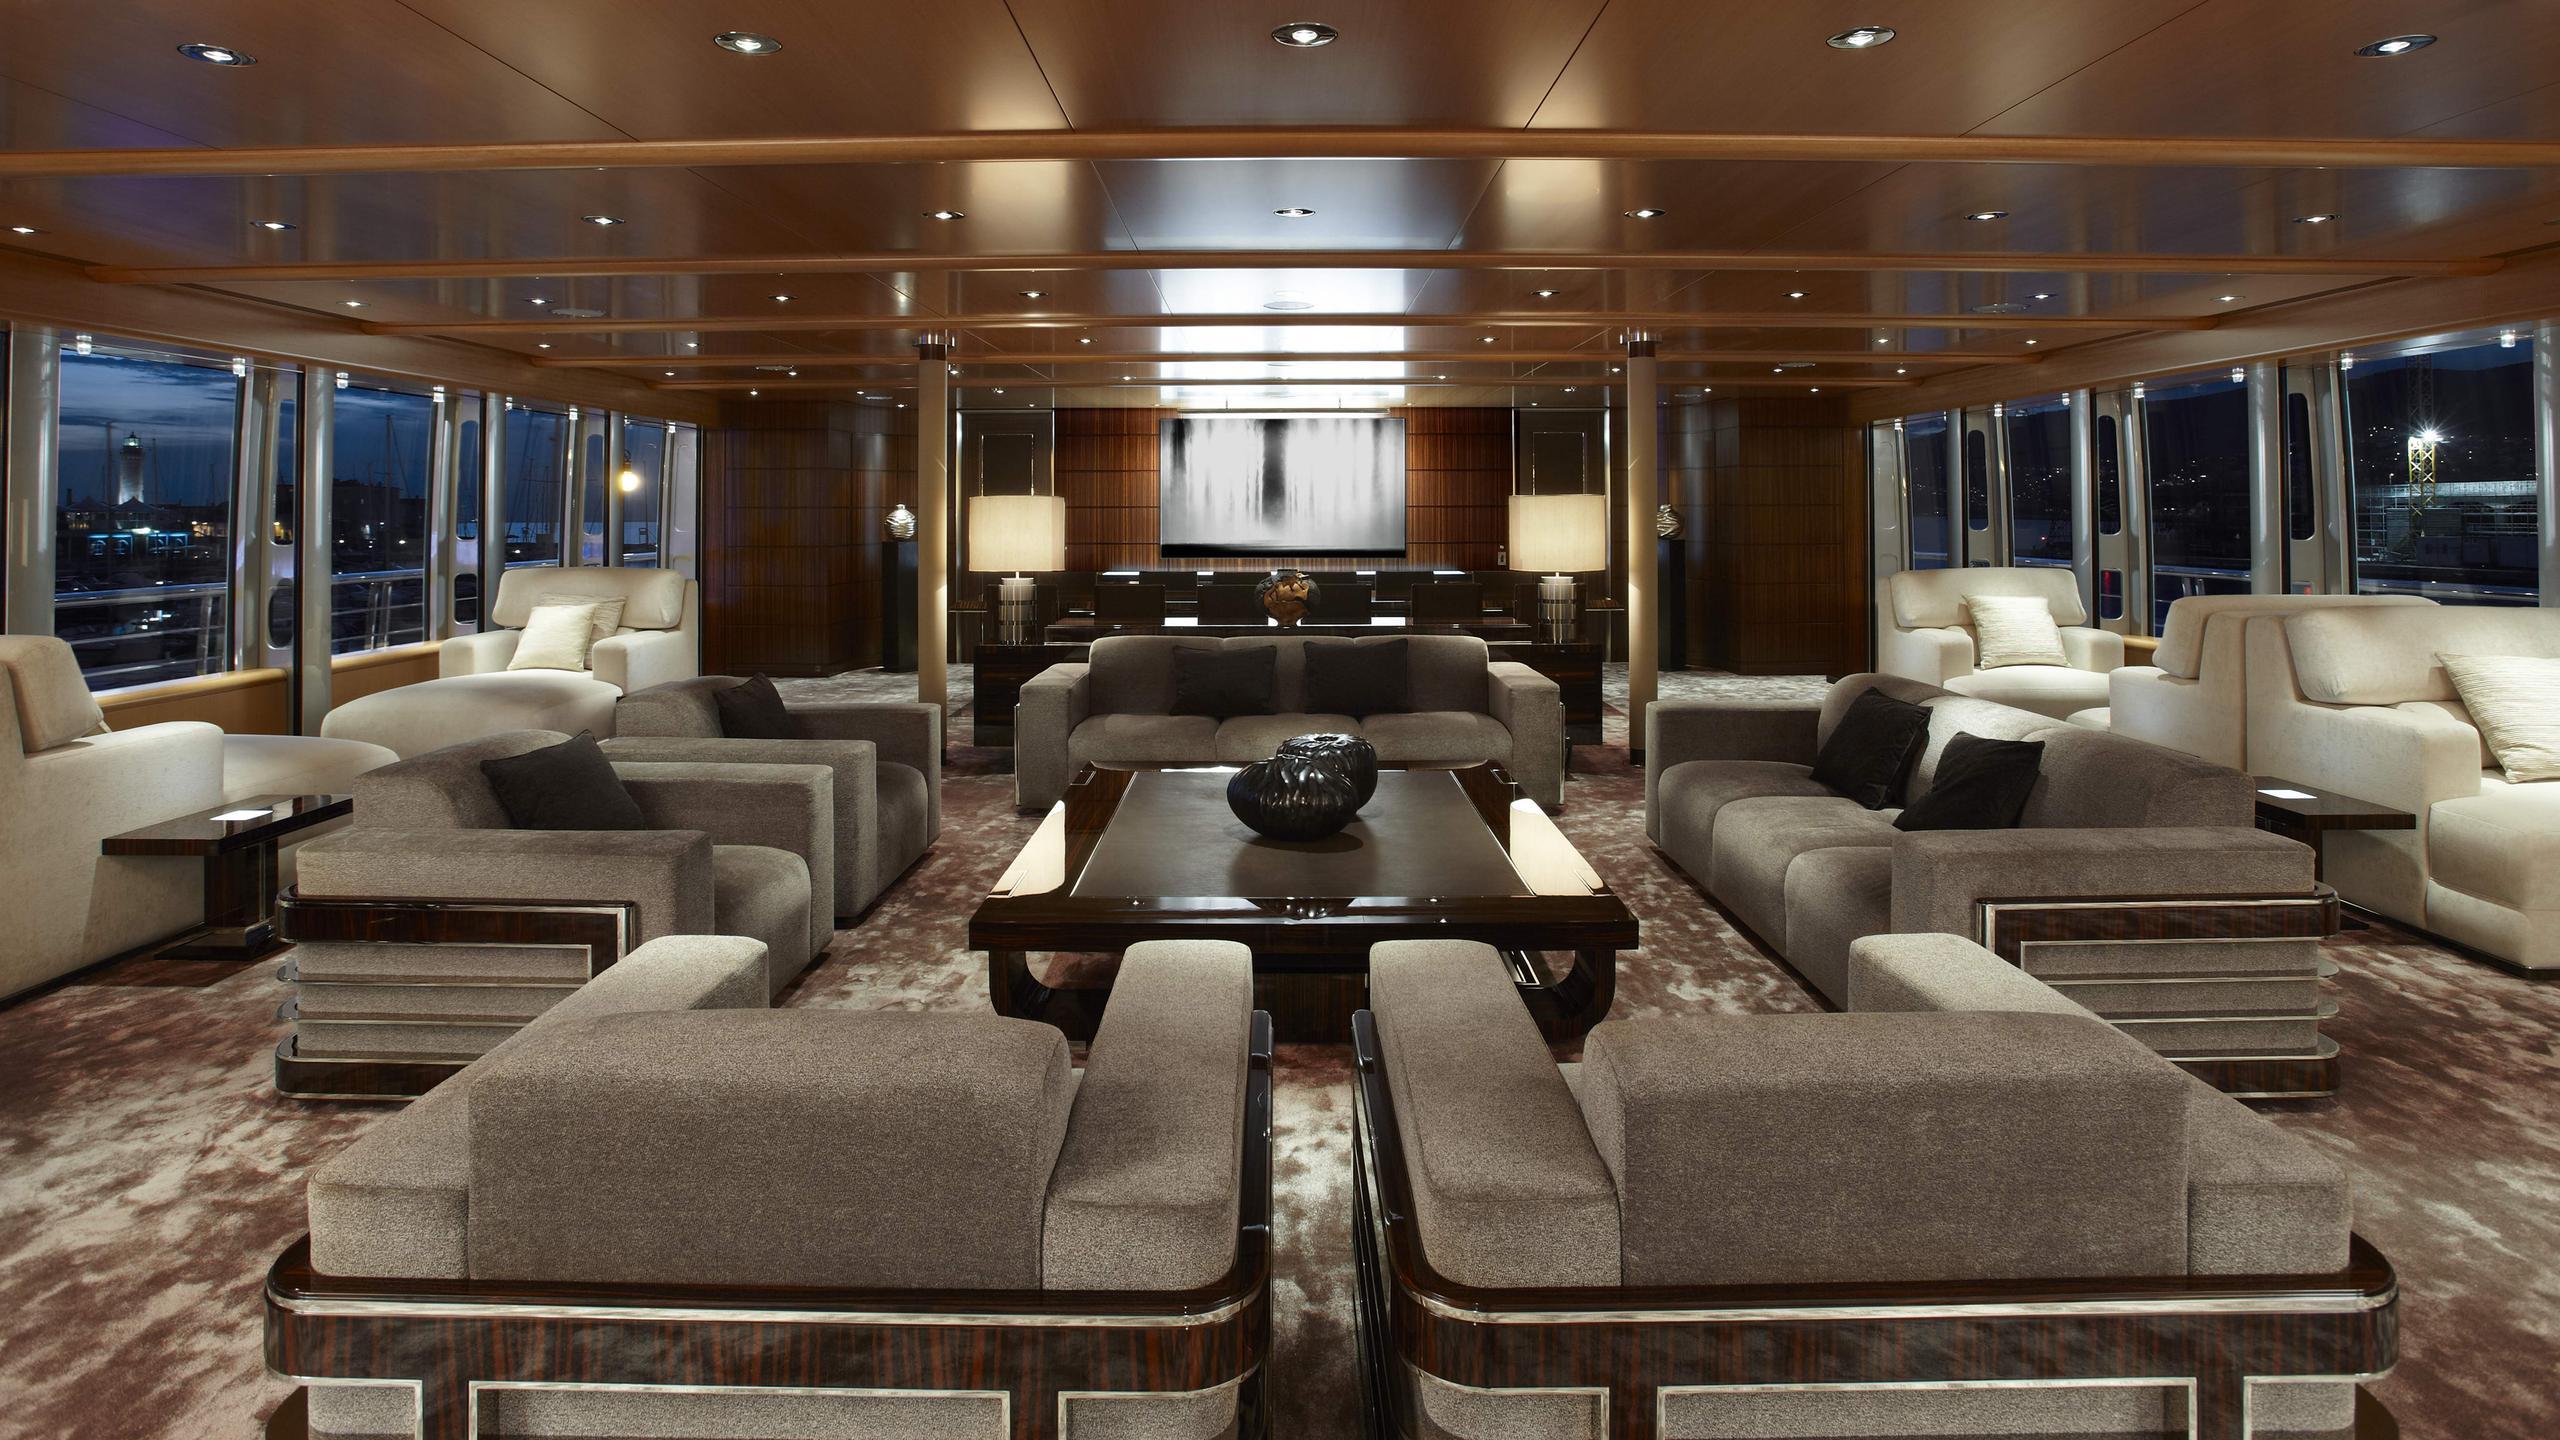 musashi-motor-yacht-feadhsip-2011-88m-saloon